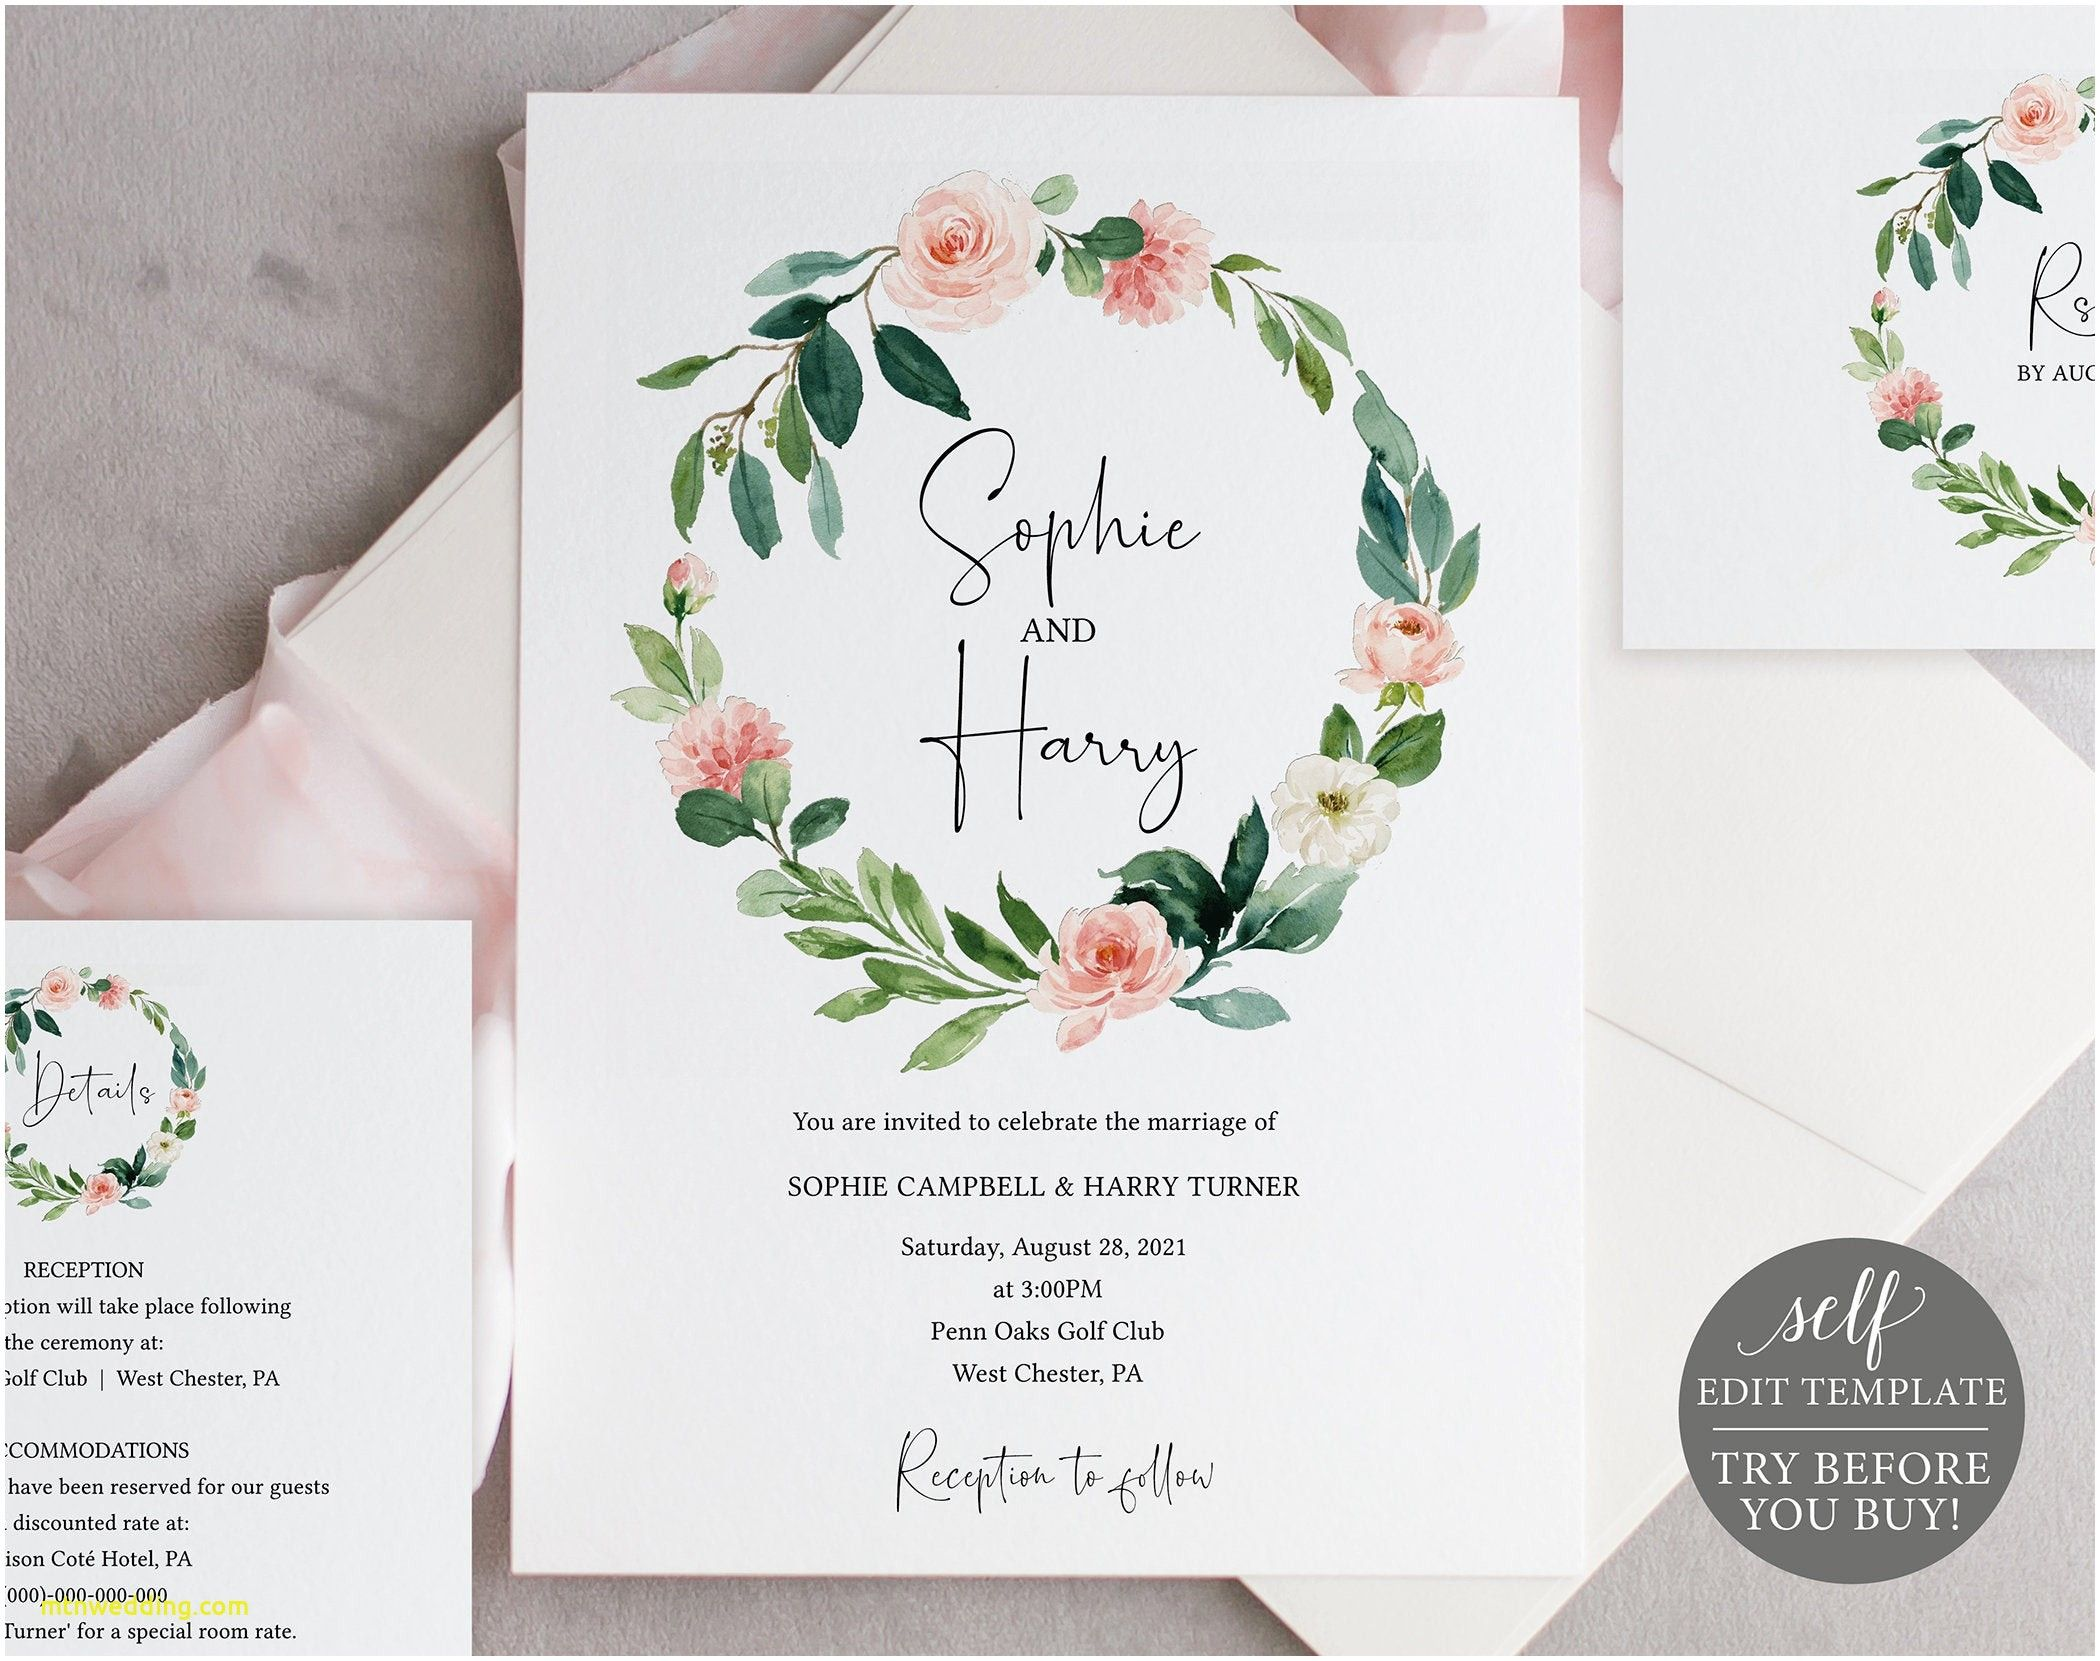 Unique Cheap Wedding Invitations Uk Online Check More At Http Mtnwedding Com Wedding Invitation Cheap Wedding Invitations Uk Online